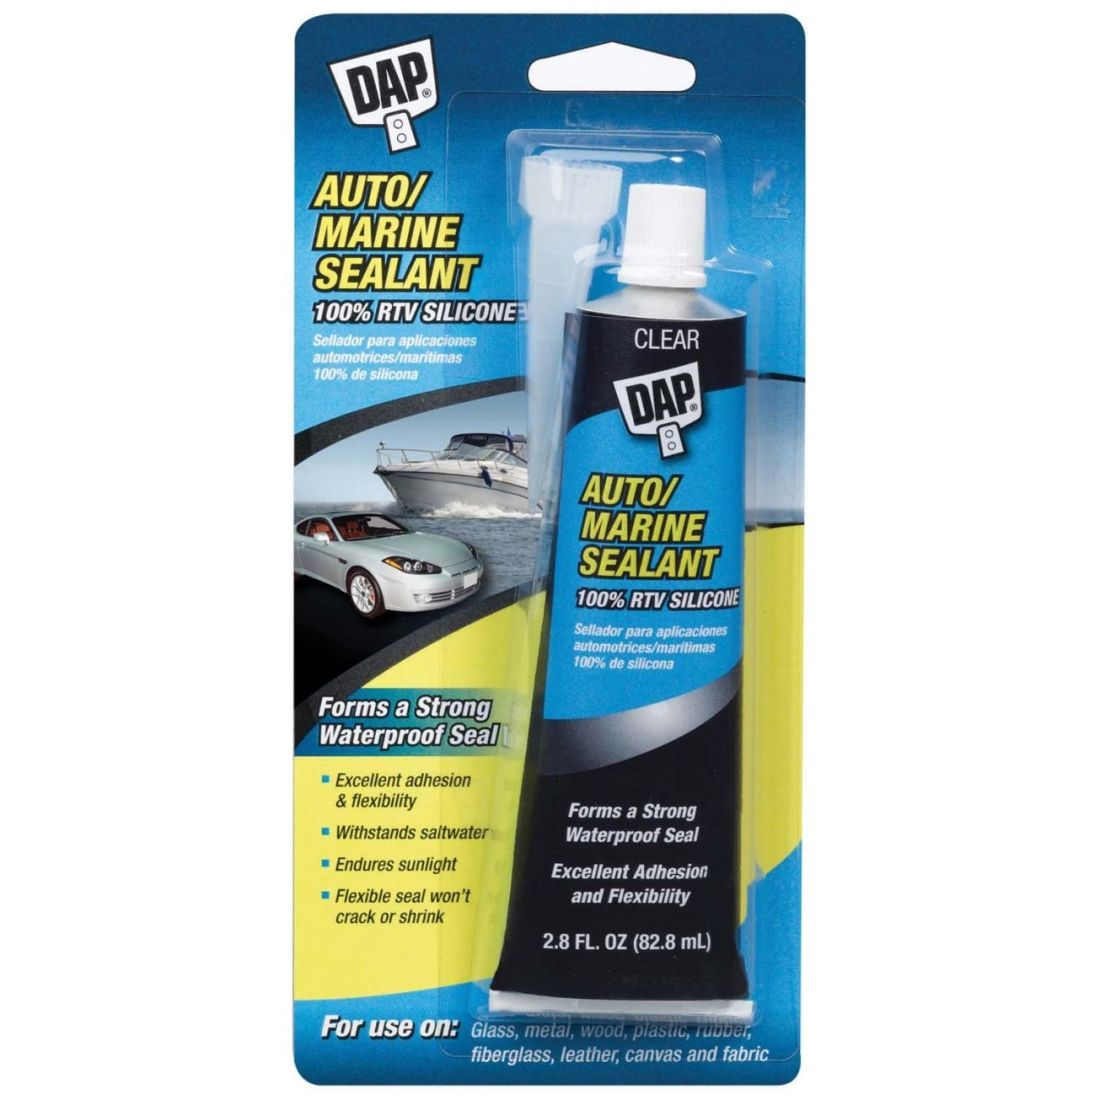 Dap automarine silicone sealant 00694 automotive